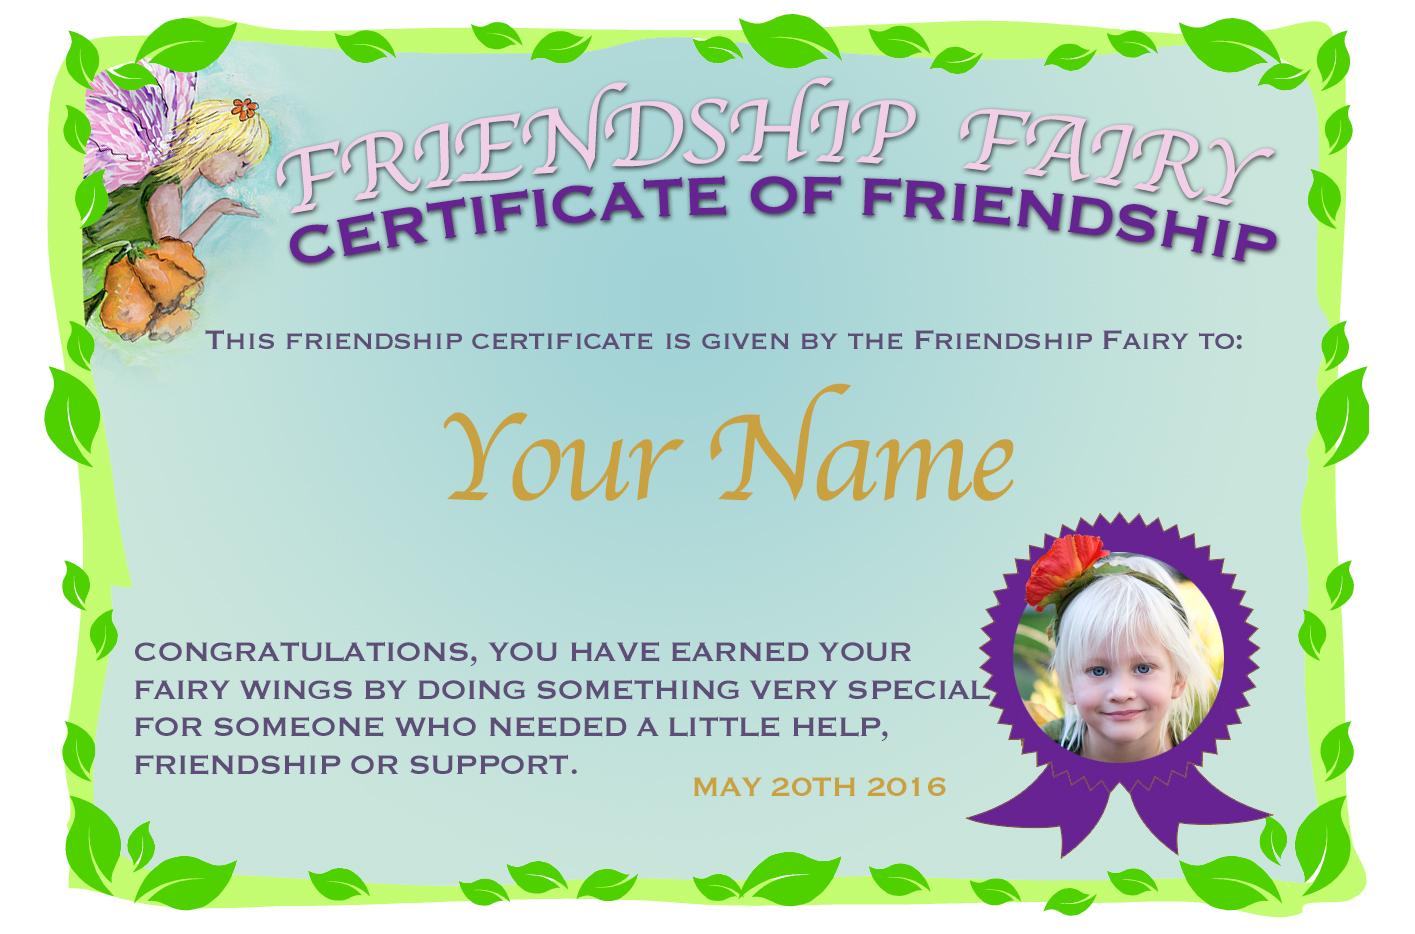 friendshipfairycertificate.jpg